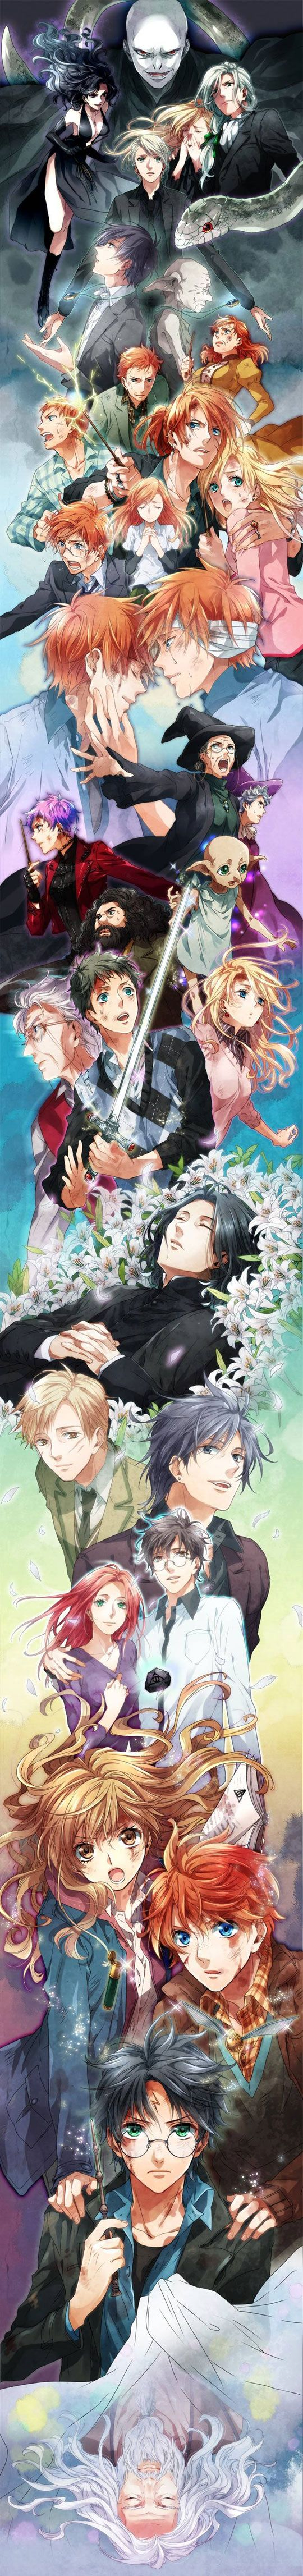 Like it!: Anime Manga, Harrypotter, Anime Style, Art, Book, Harry Potter Anime, Fandom, Anime Harry